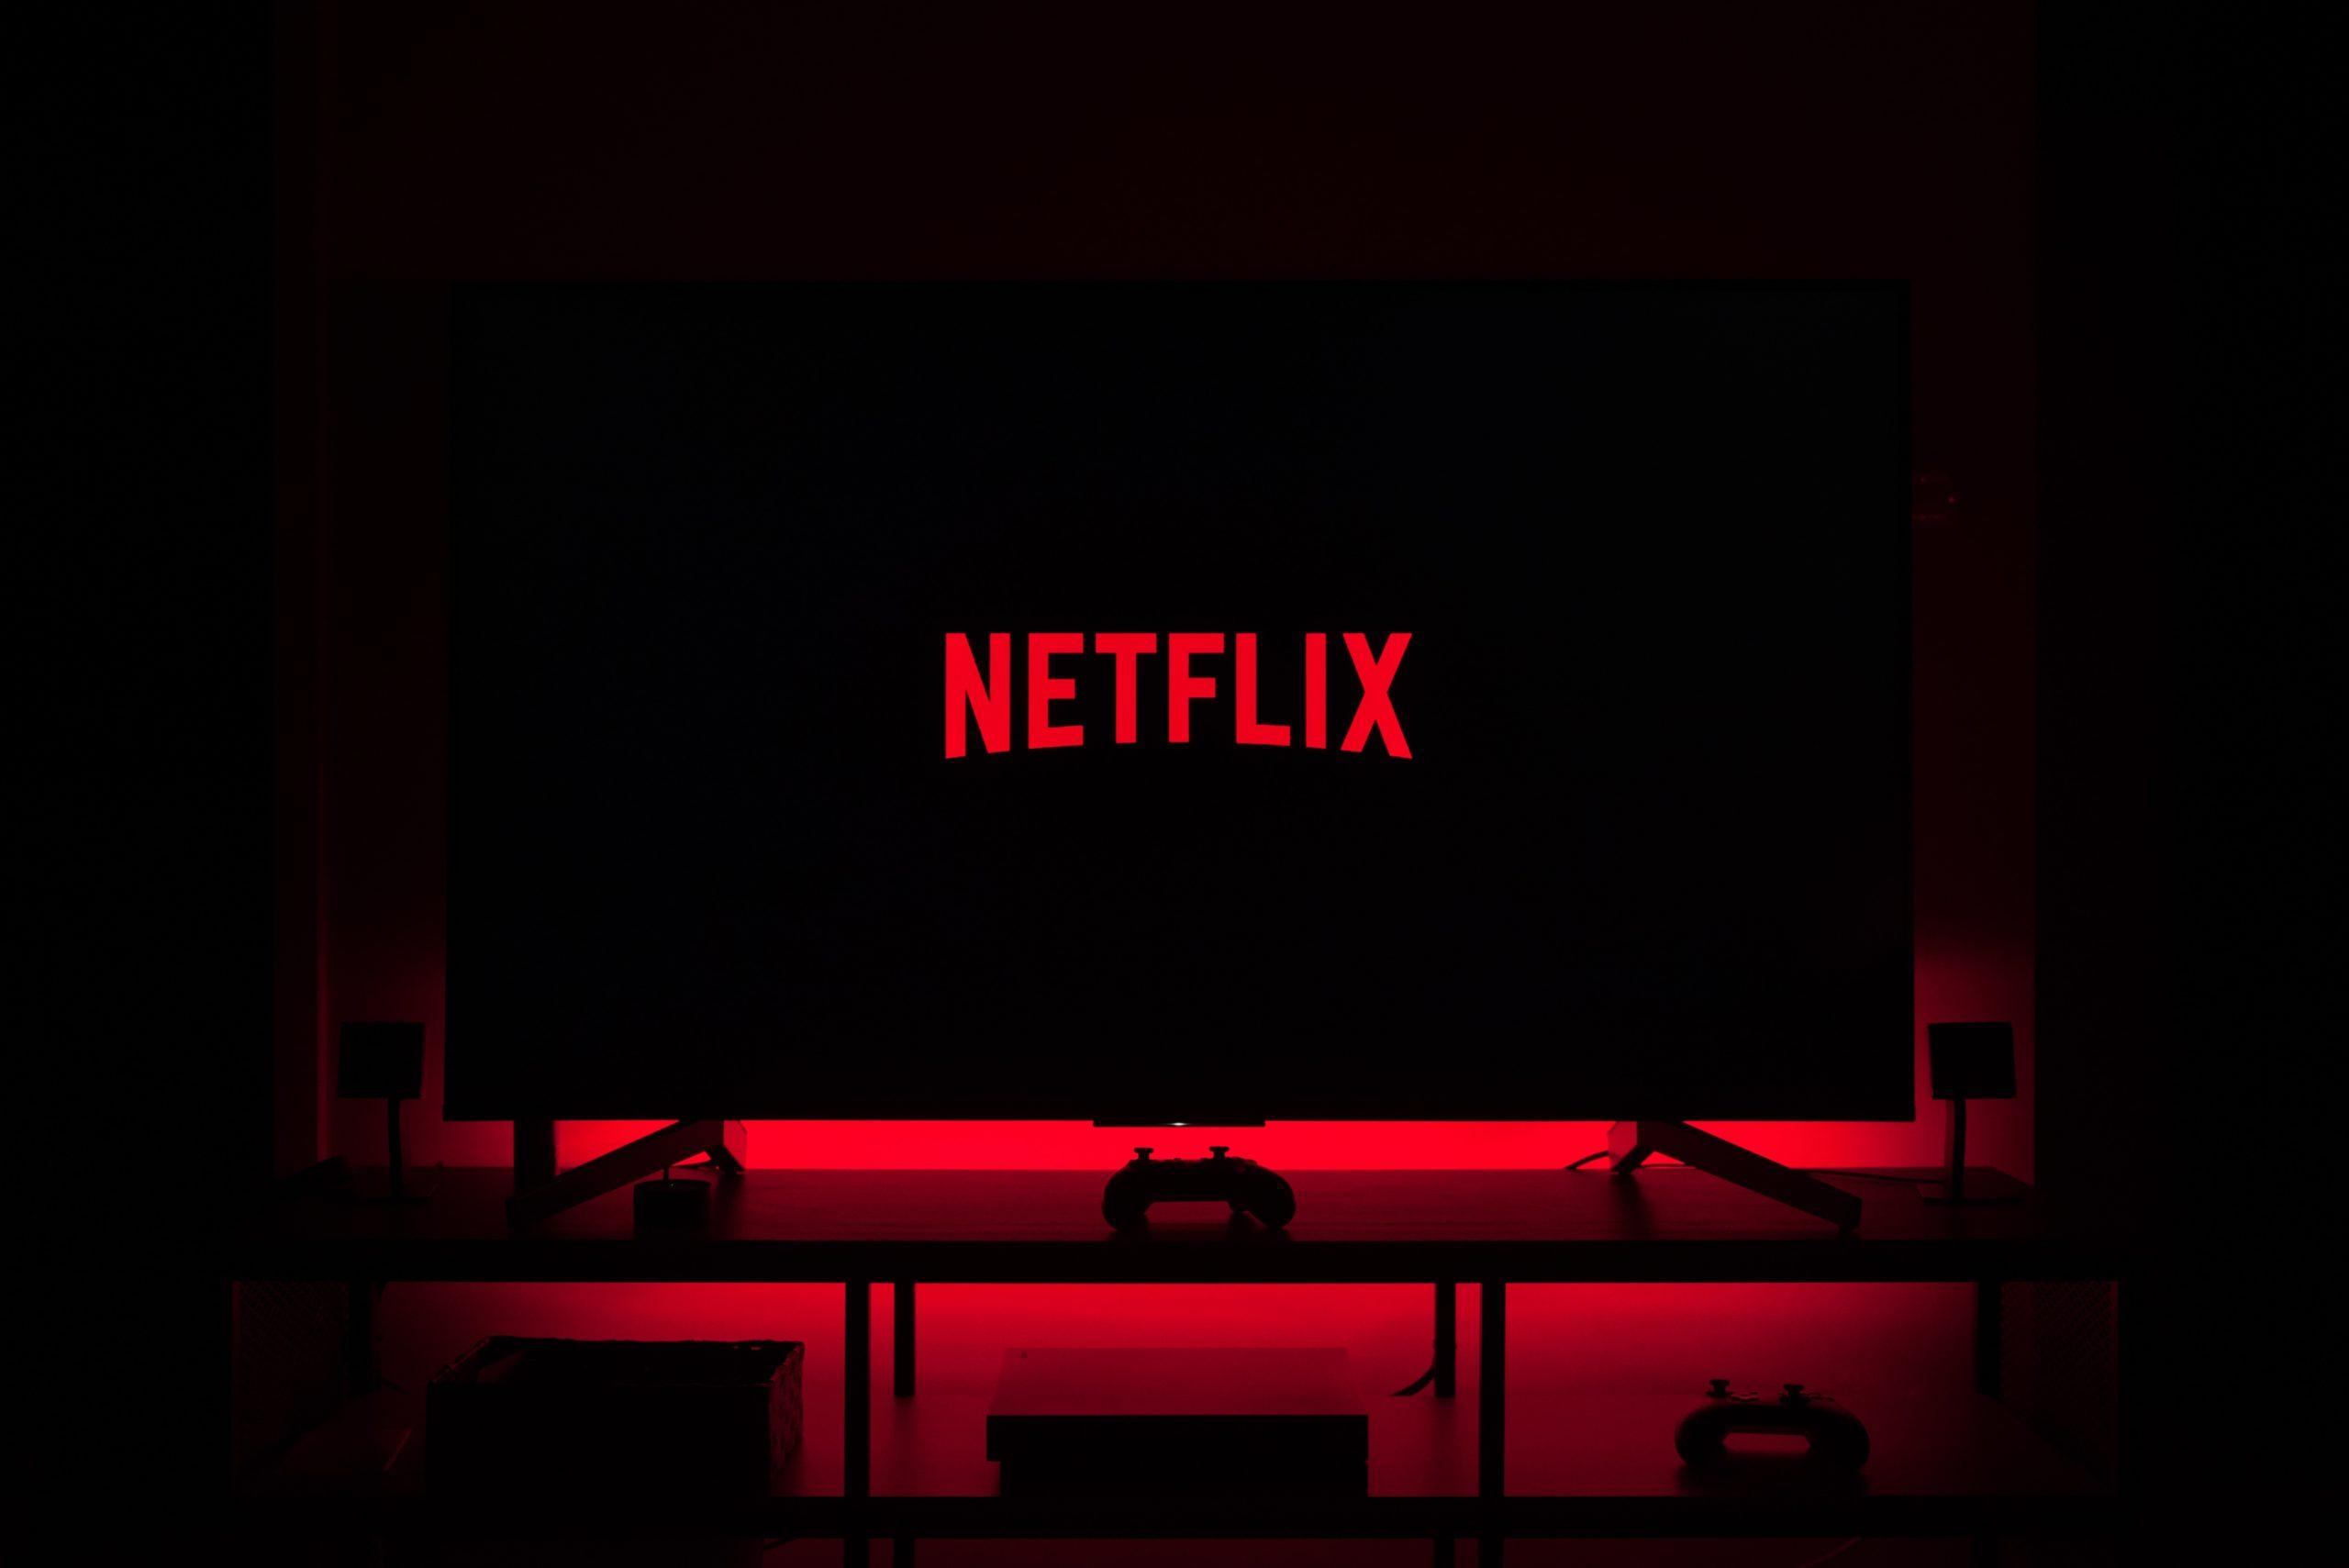 Netflix July 2020 content